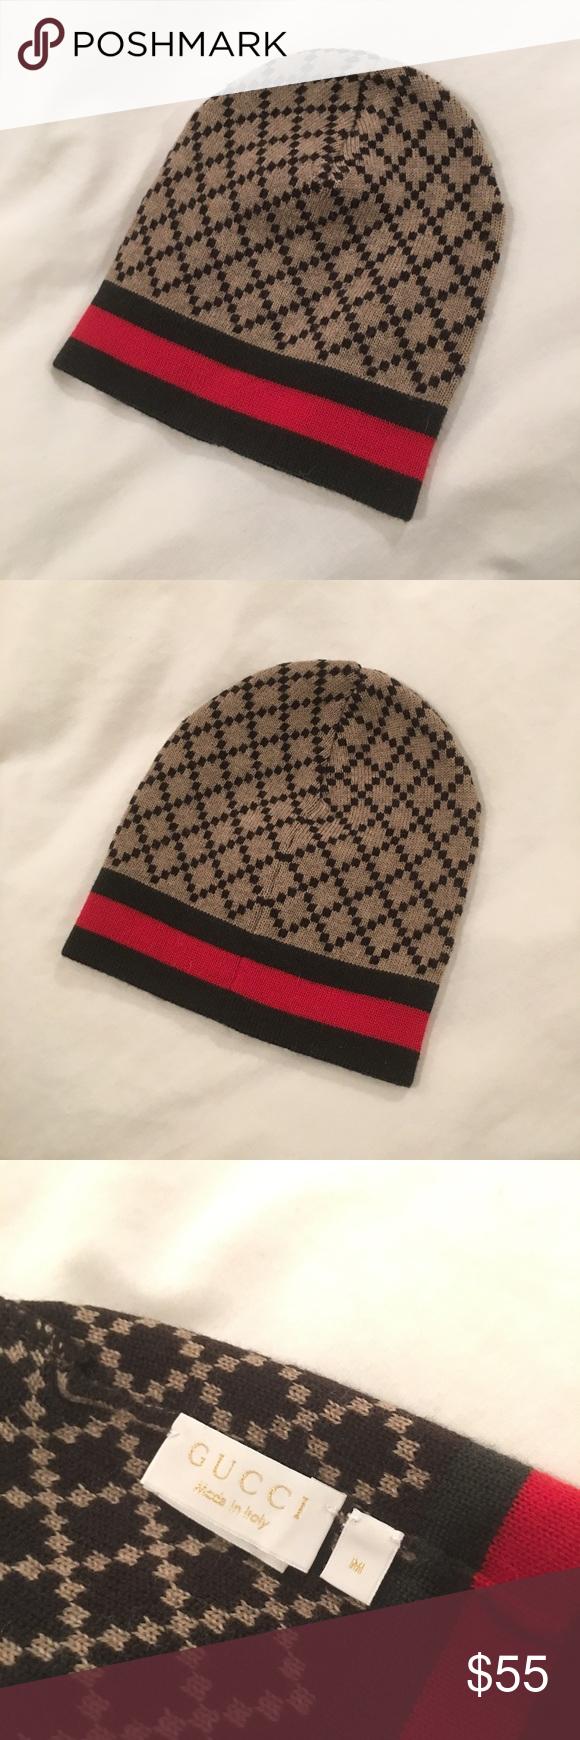 cbd7c8d7fd180 Children s Gucci Winter hat size M Signature Gucci logo hat. For kids. Gucci  Accessories Hats